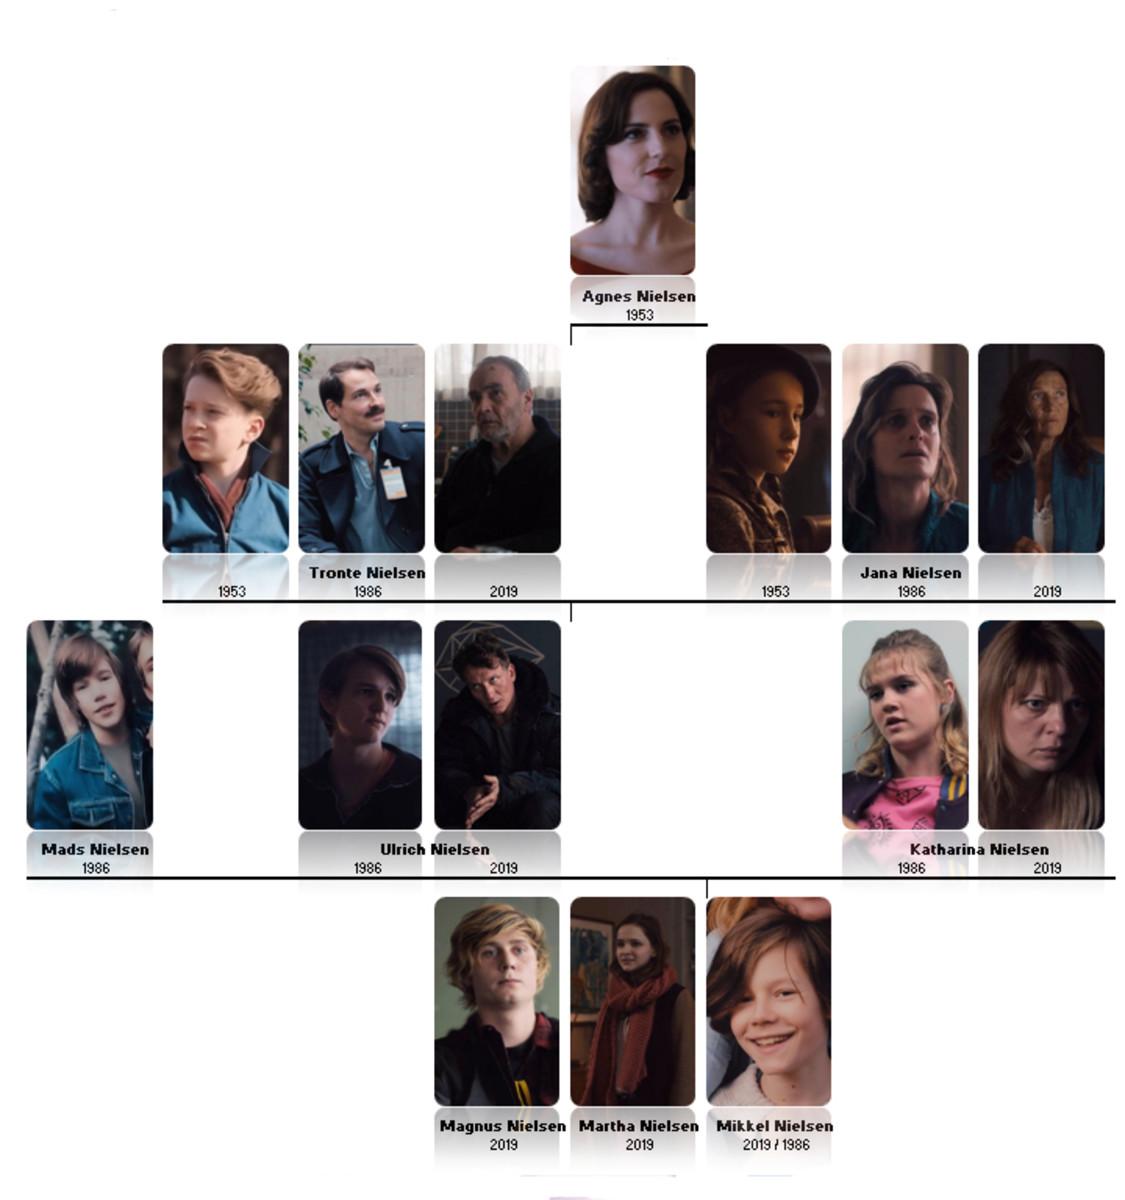 Nielsen family tree from 'Dark' (2017), a Netflix Original Series.